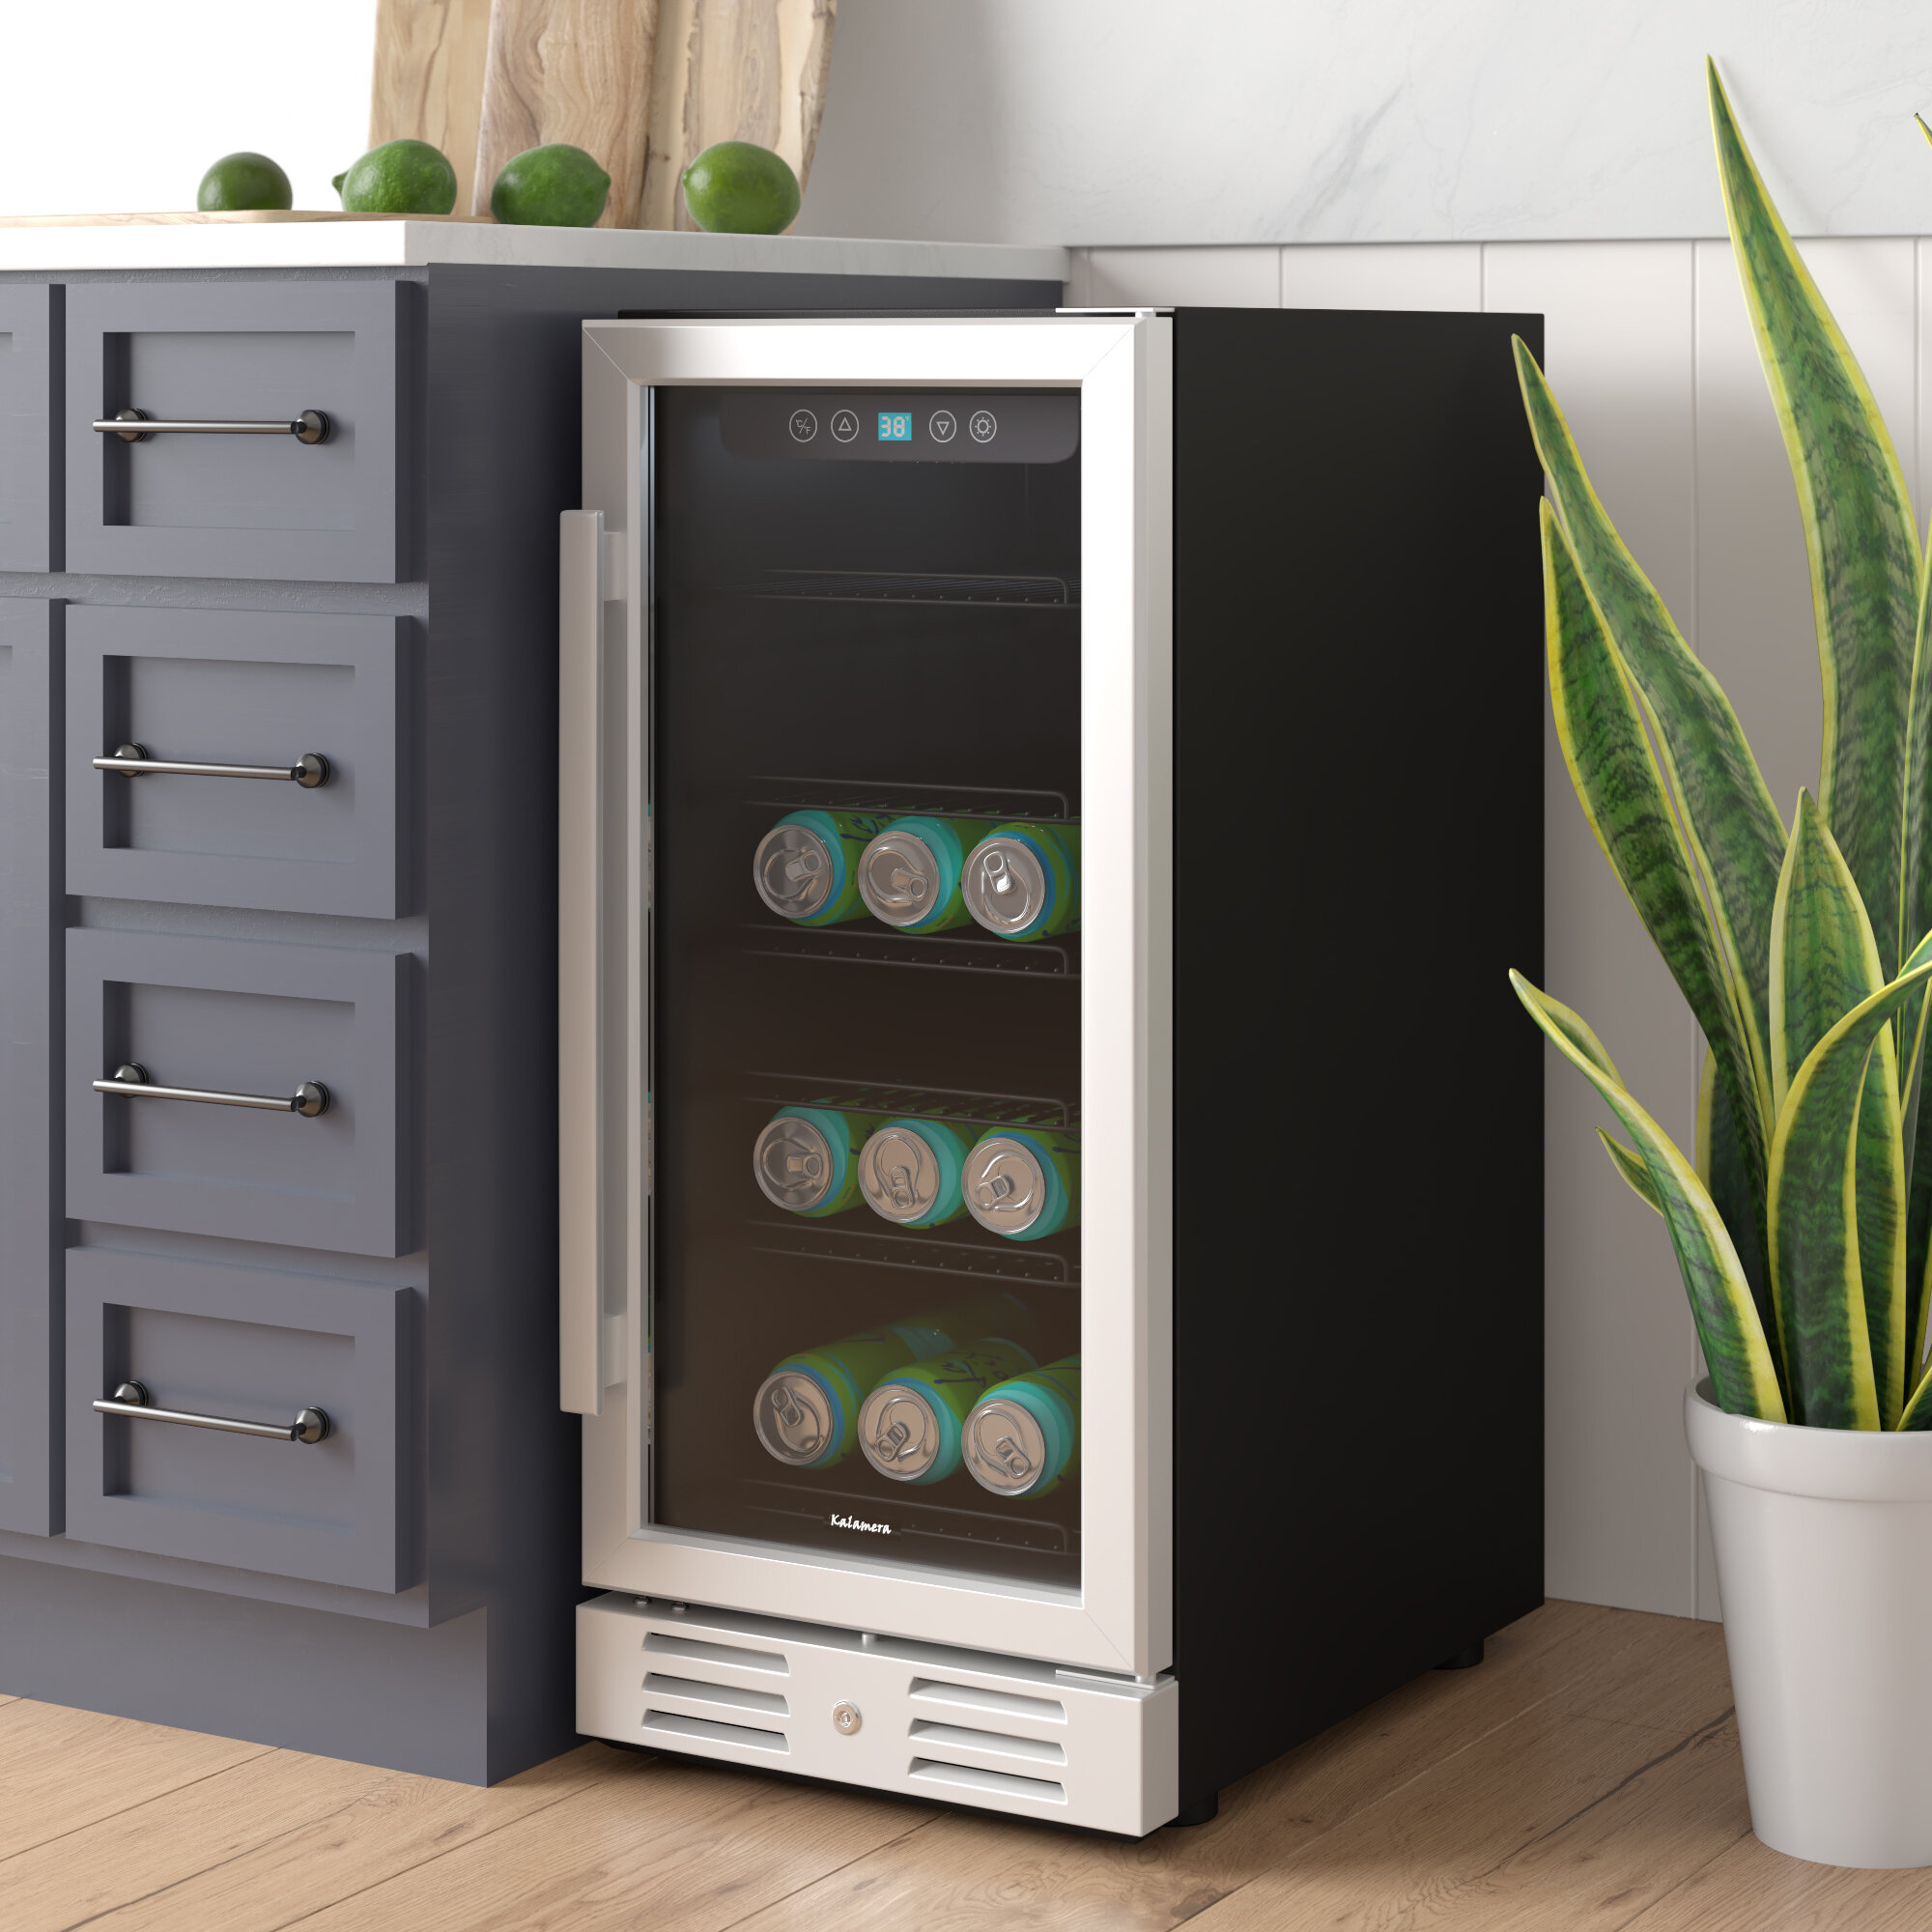 Kalamera 96 Can 15 Convertible Beverage Refrigerator Reviews Wayfair